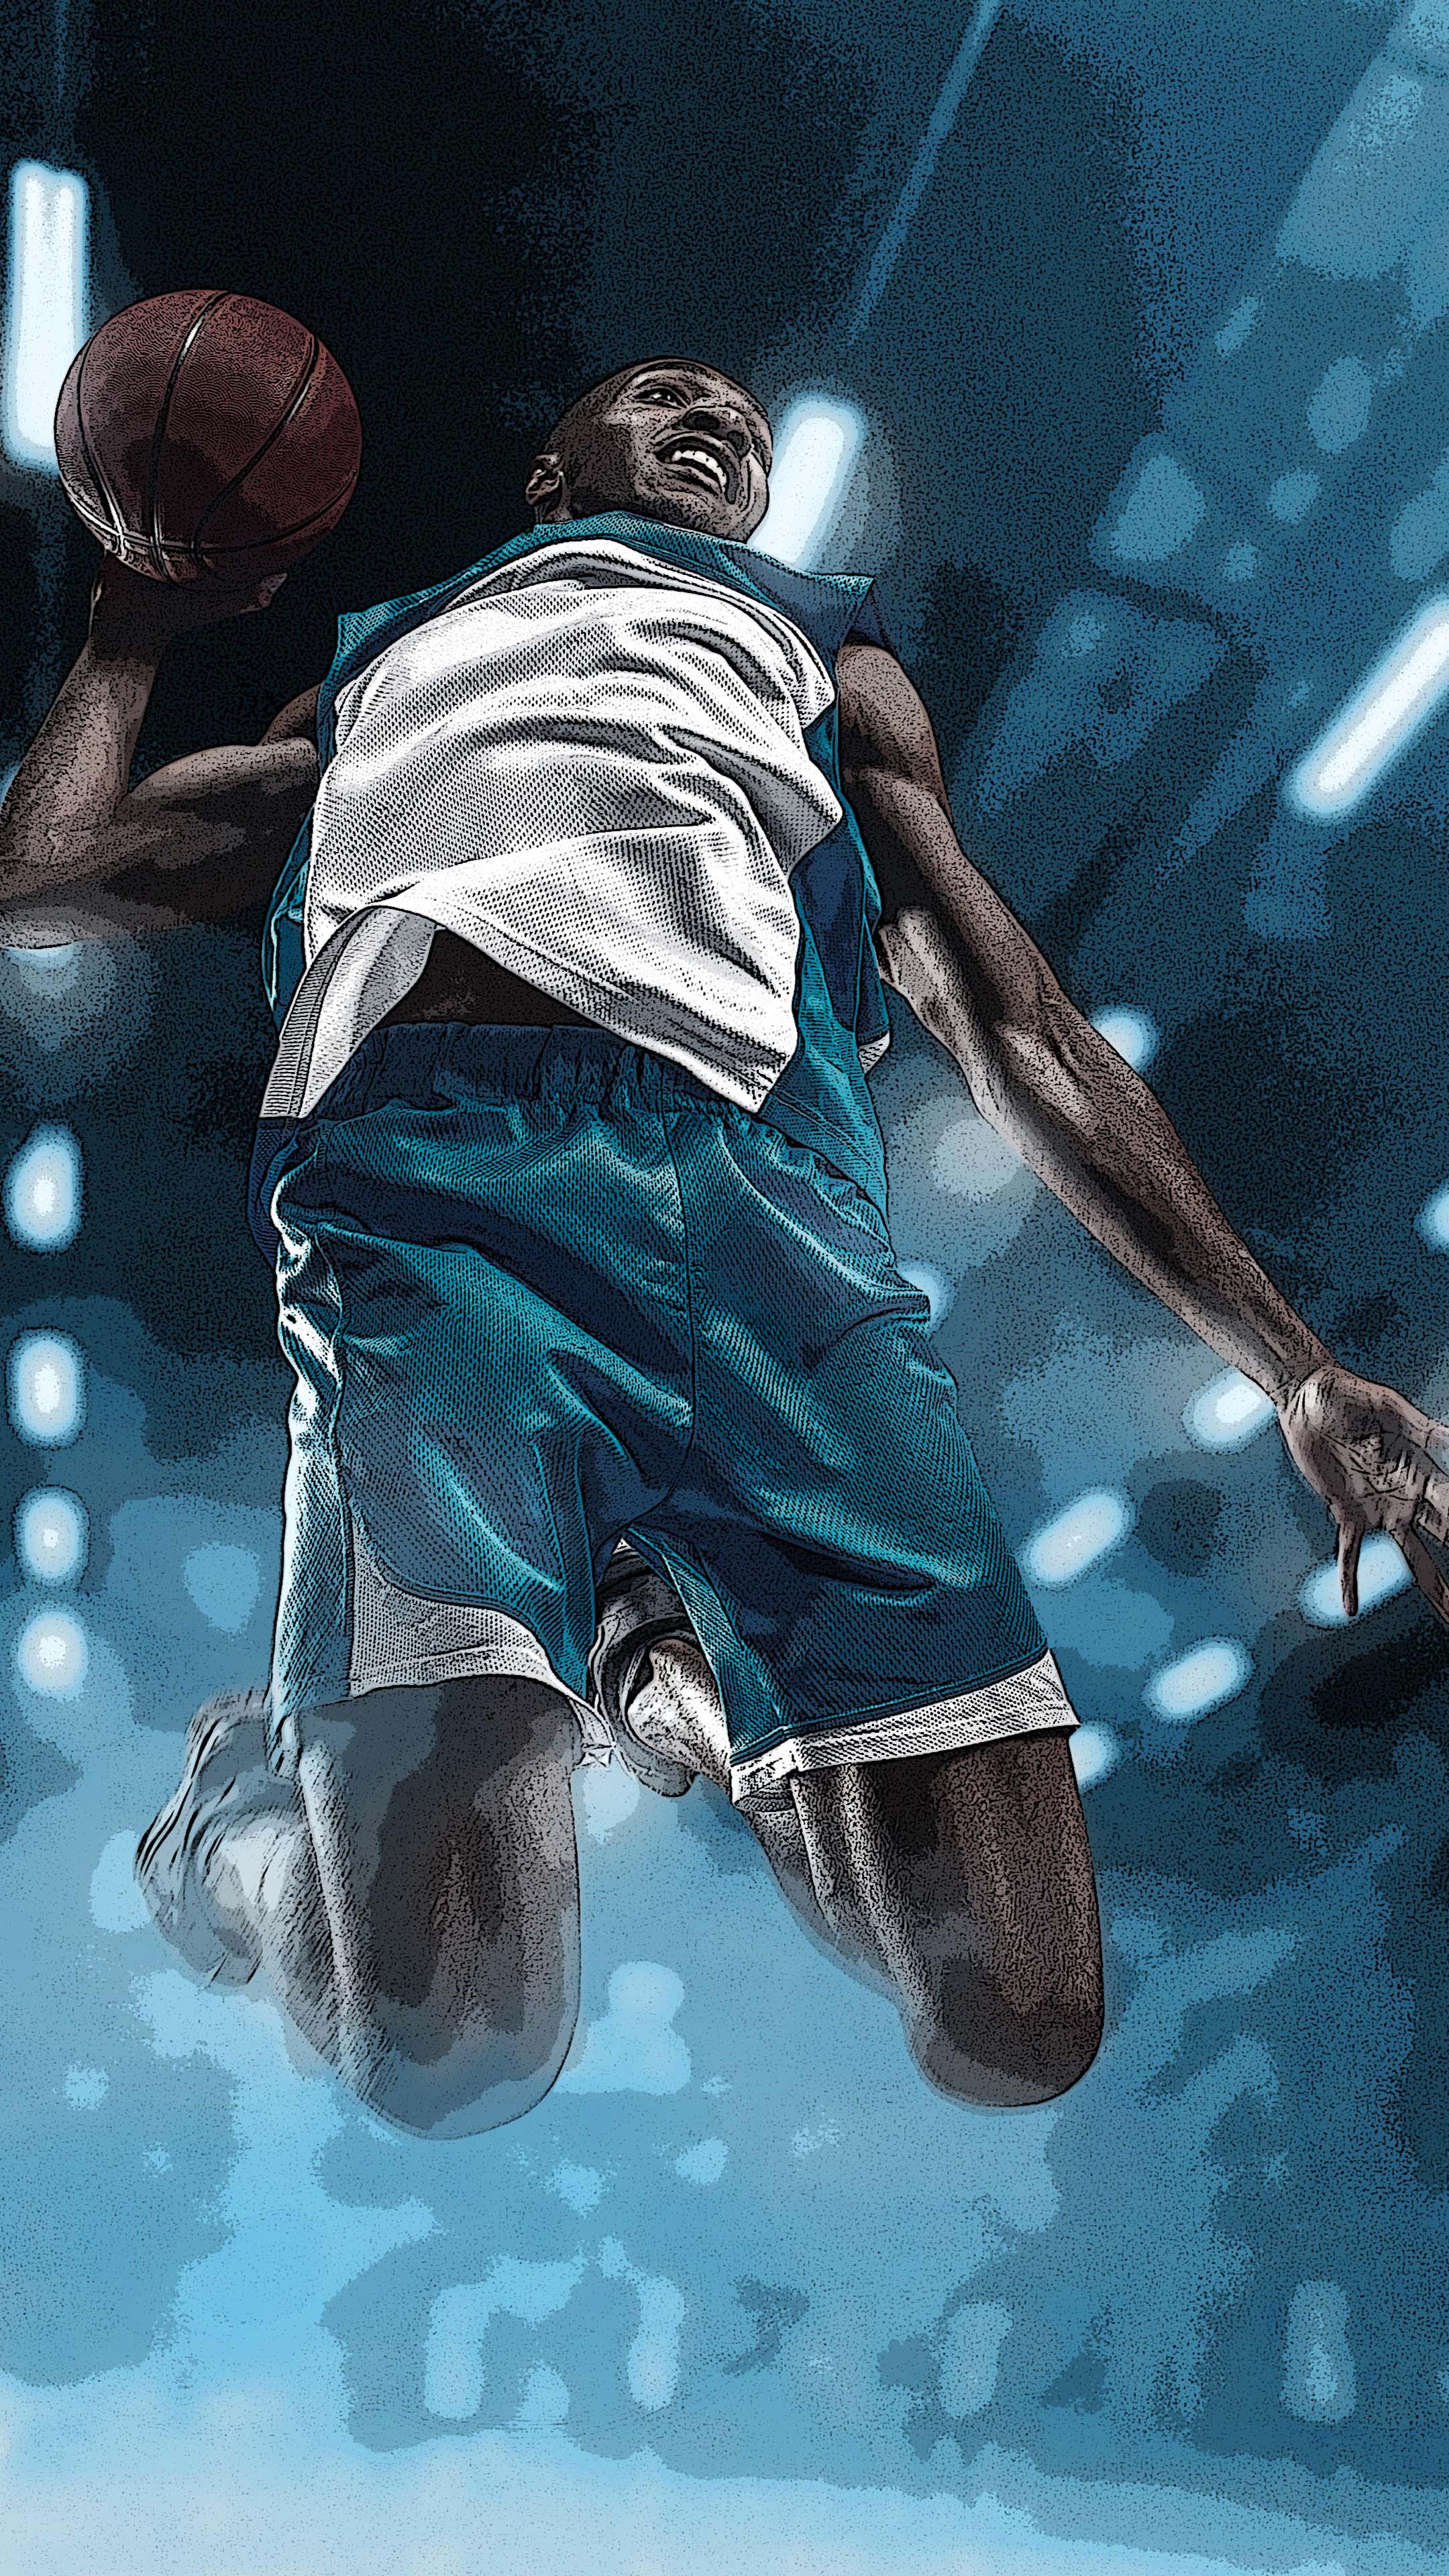 Basketball Sports Artwork Free 4k Ultra Hd Mobile Wallpaper